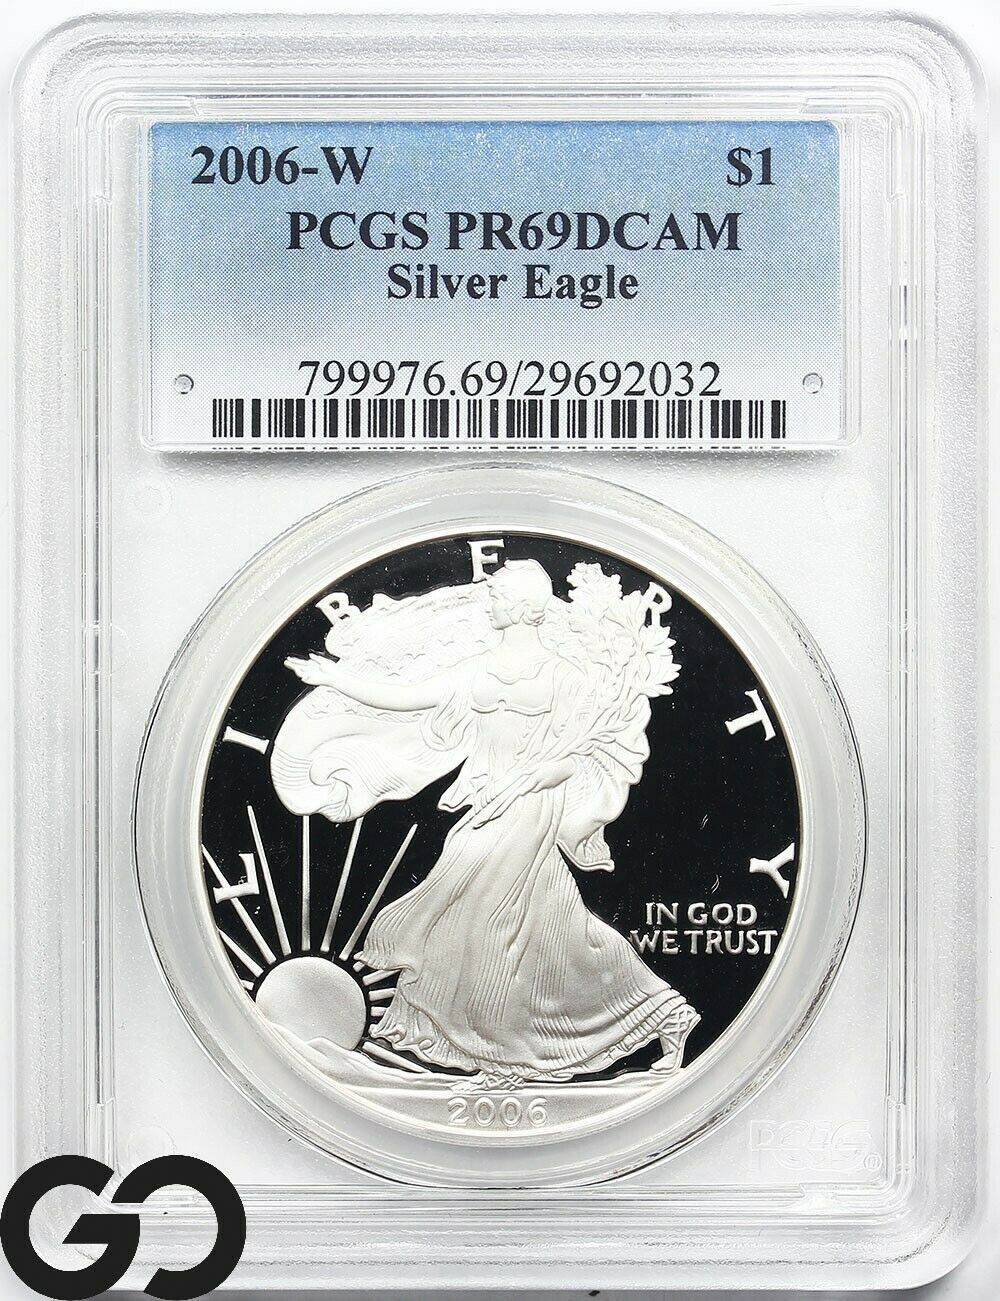 1989-S American Silver Eagle Dollar PR69DCAM PCGS Proof 69 Deep Cameo